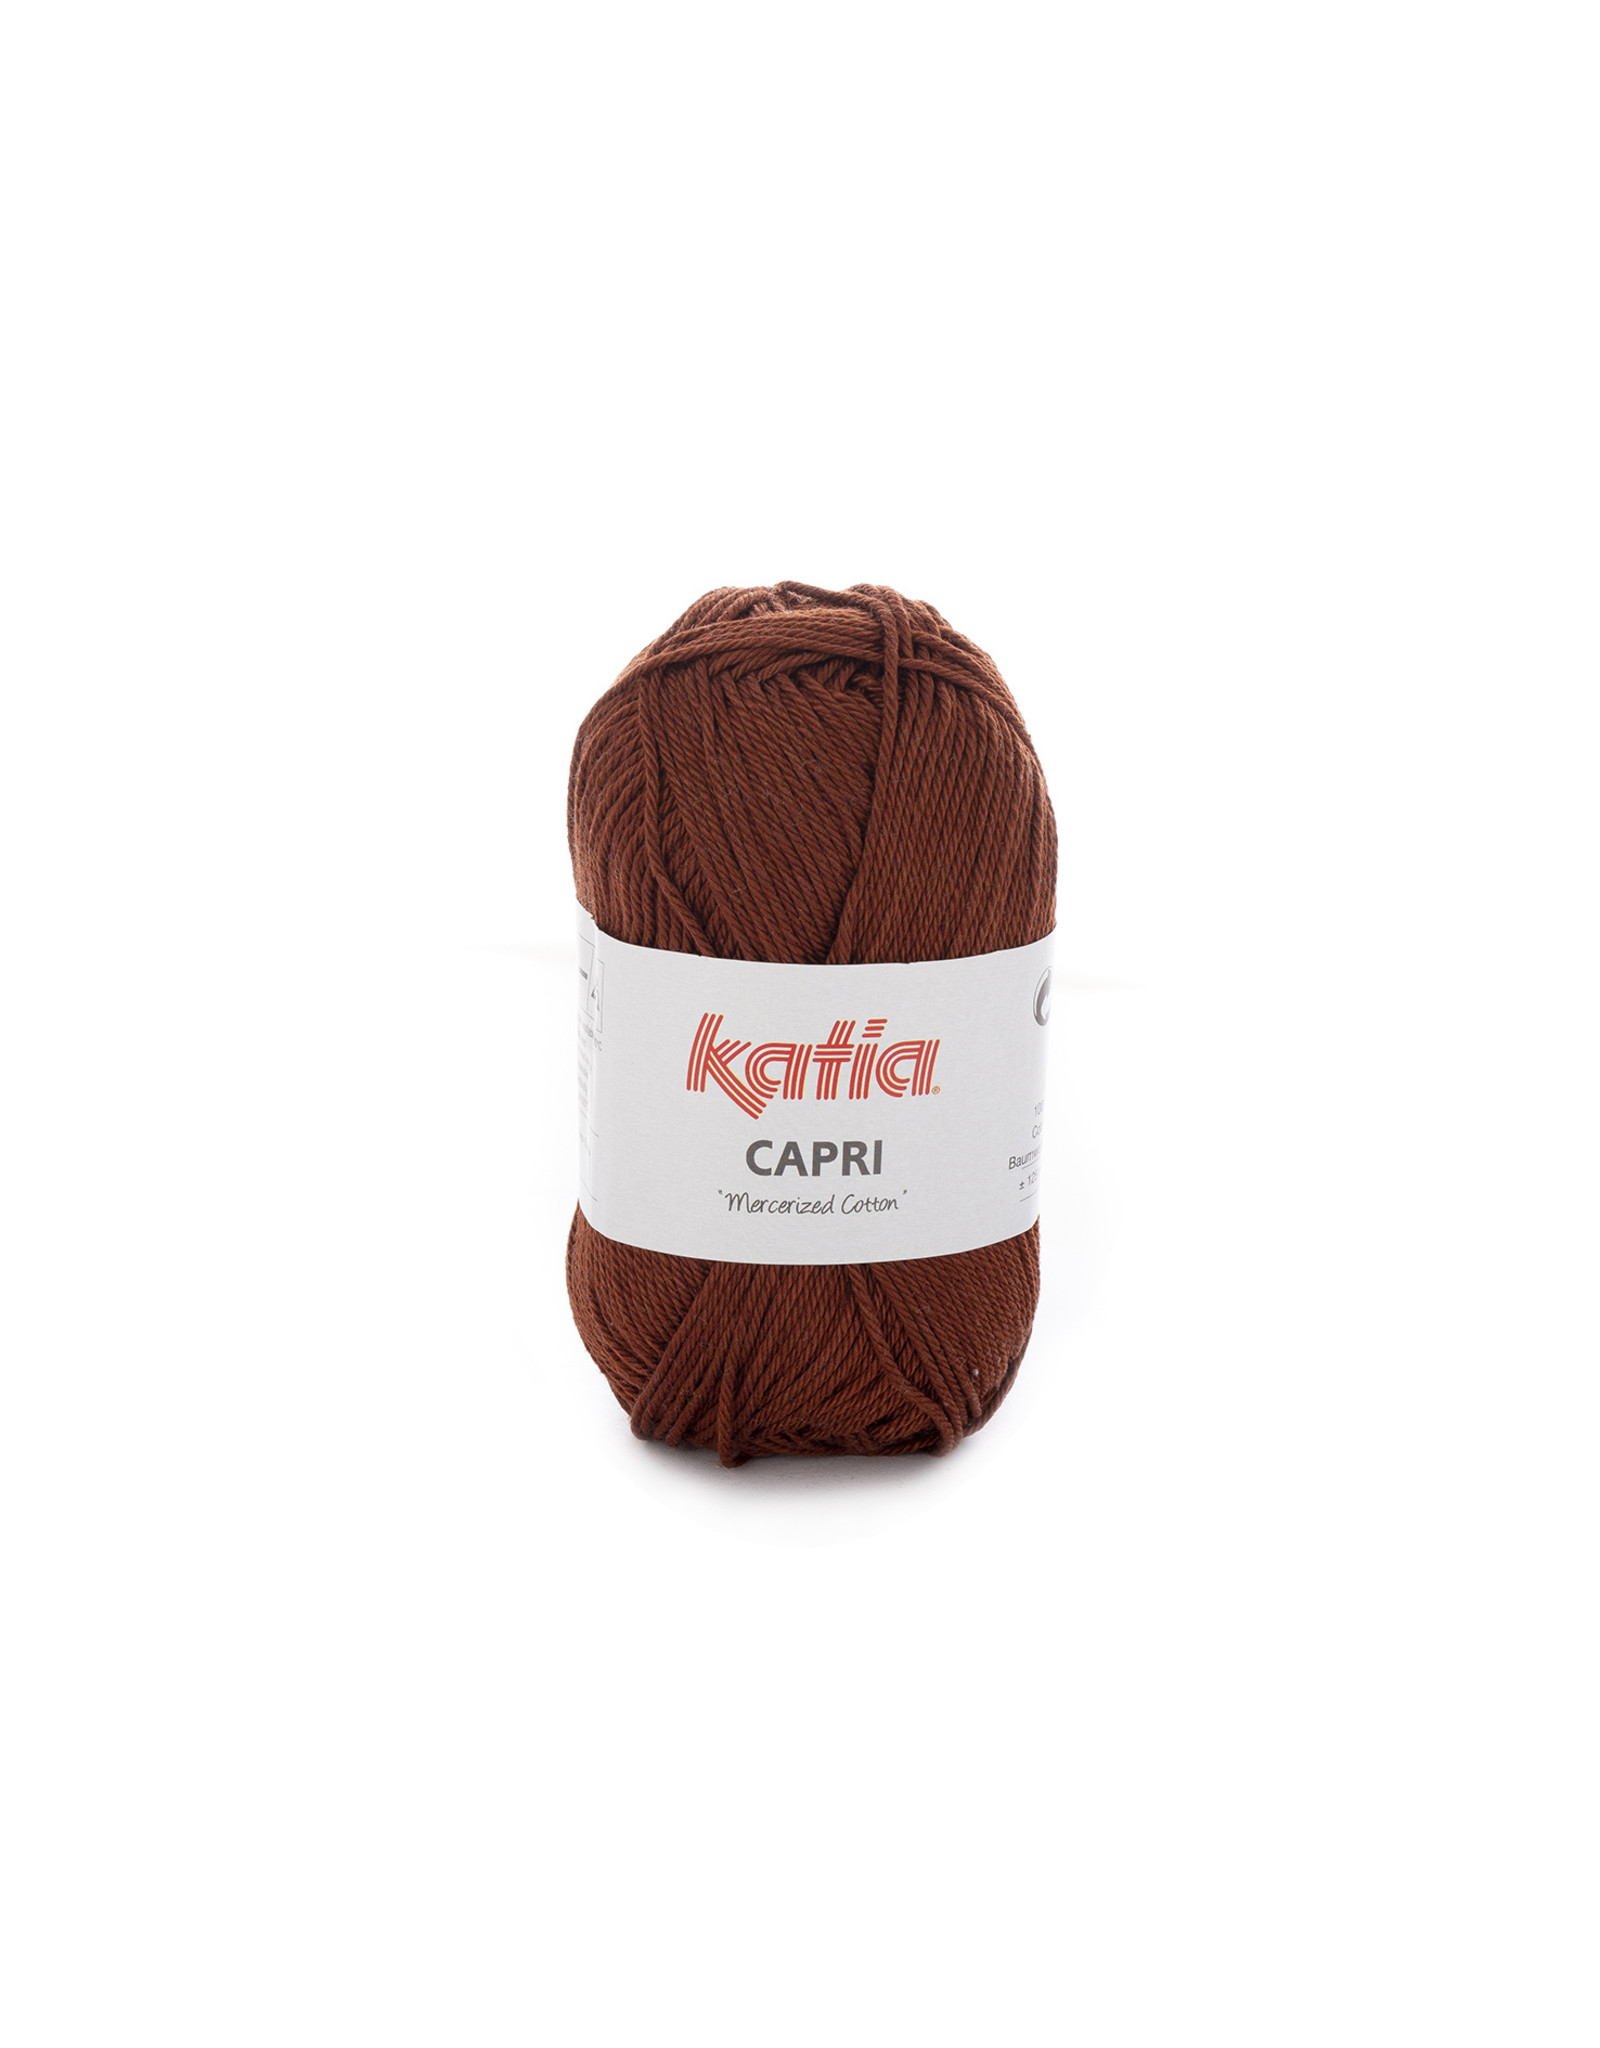 Katia Katia Capri - kleur 162 Koperbruin - 50 gr. = 125 m. - 100% katoen